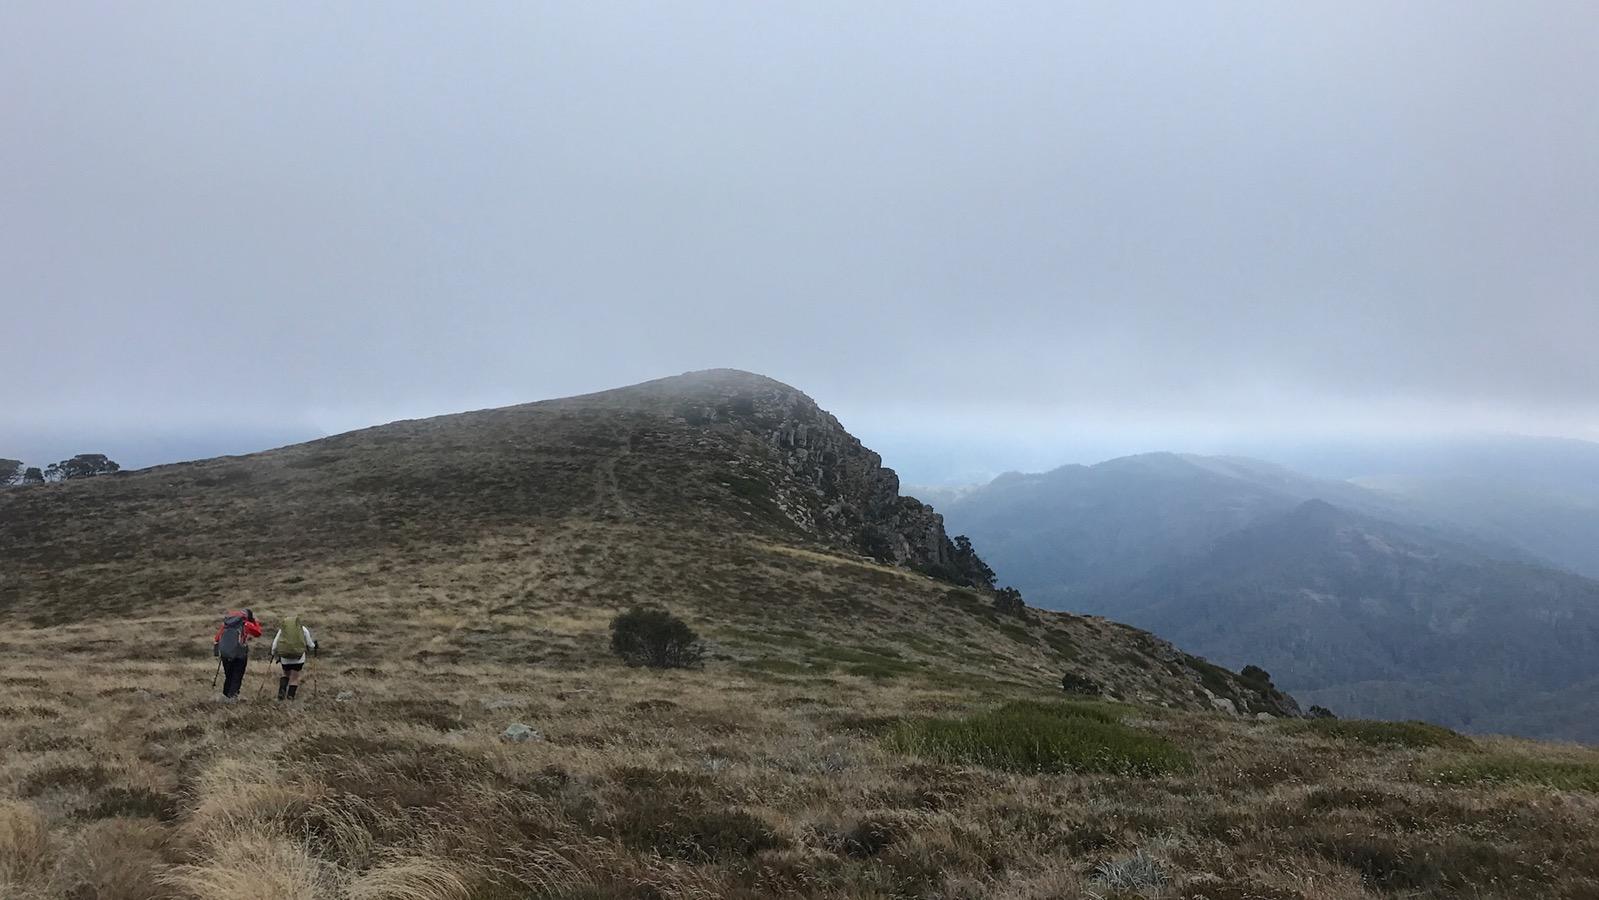 West Peak of Mt Howitt